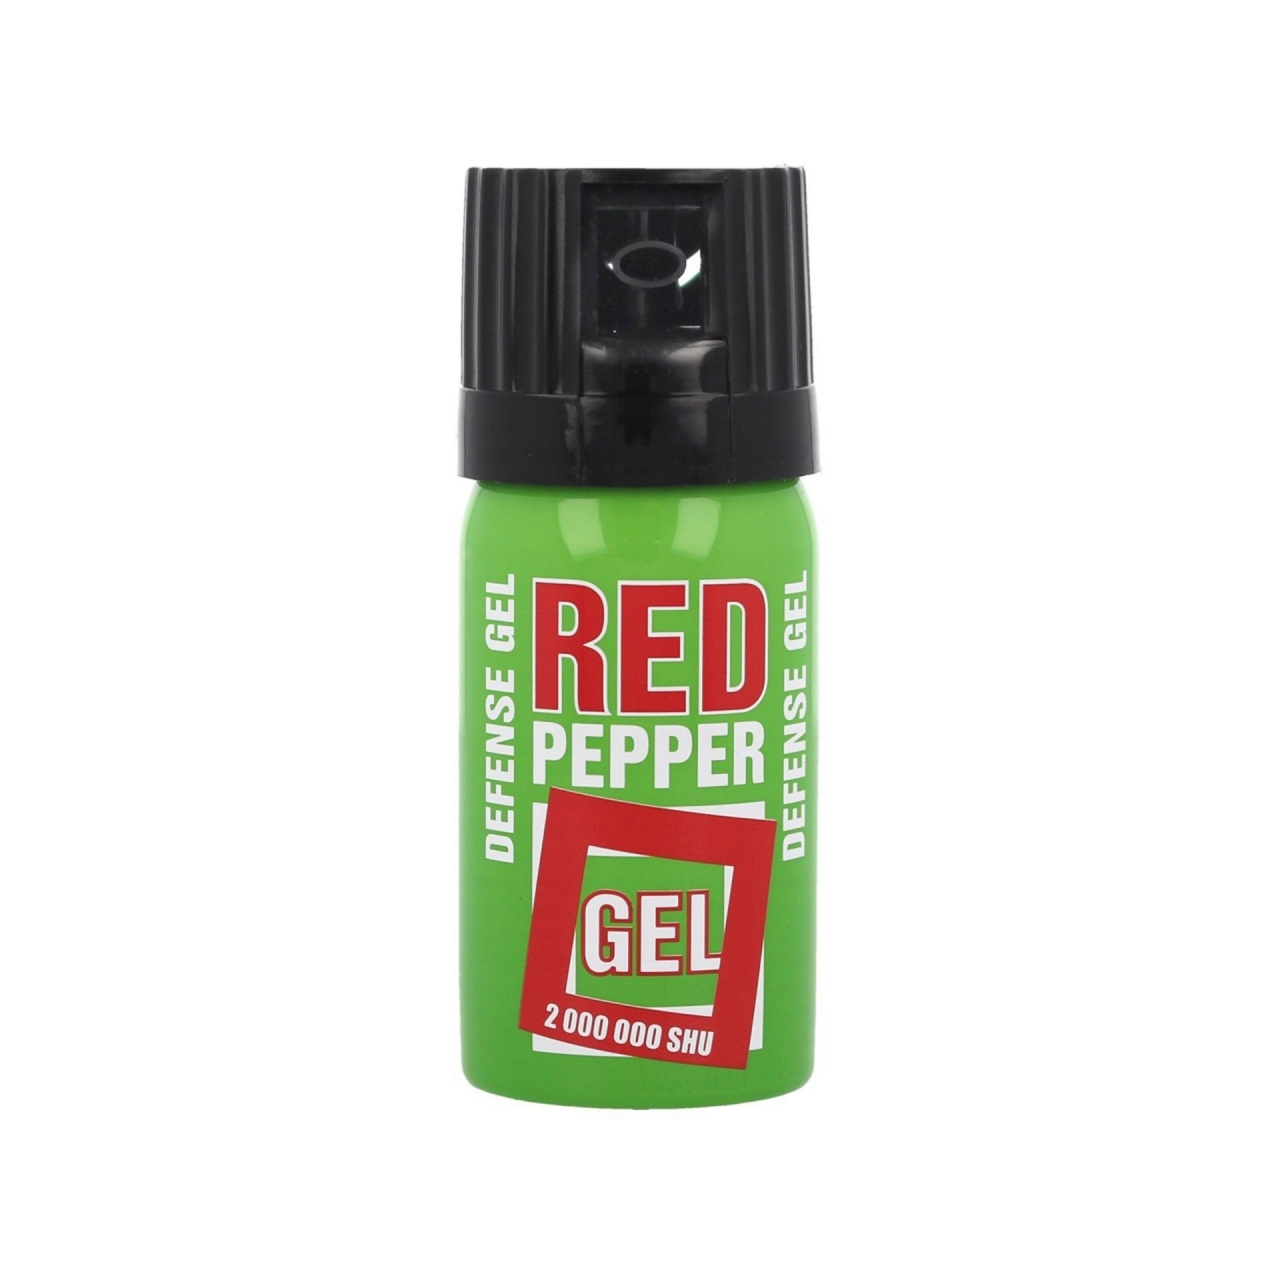 Obranný sprej Red Pepper Gel C Fog 40 ml (18+)